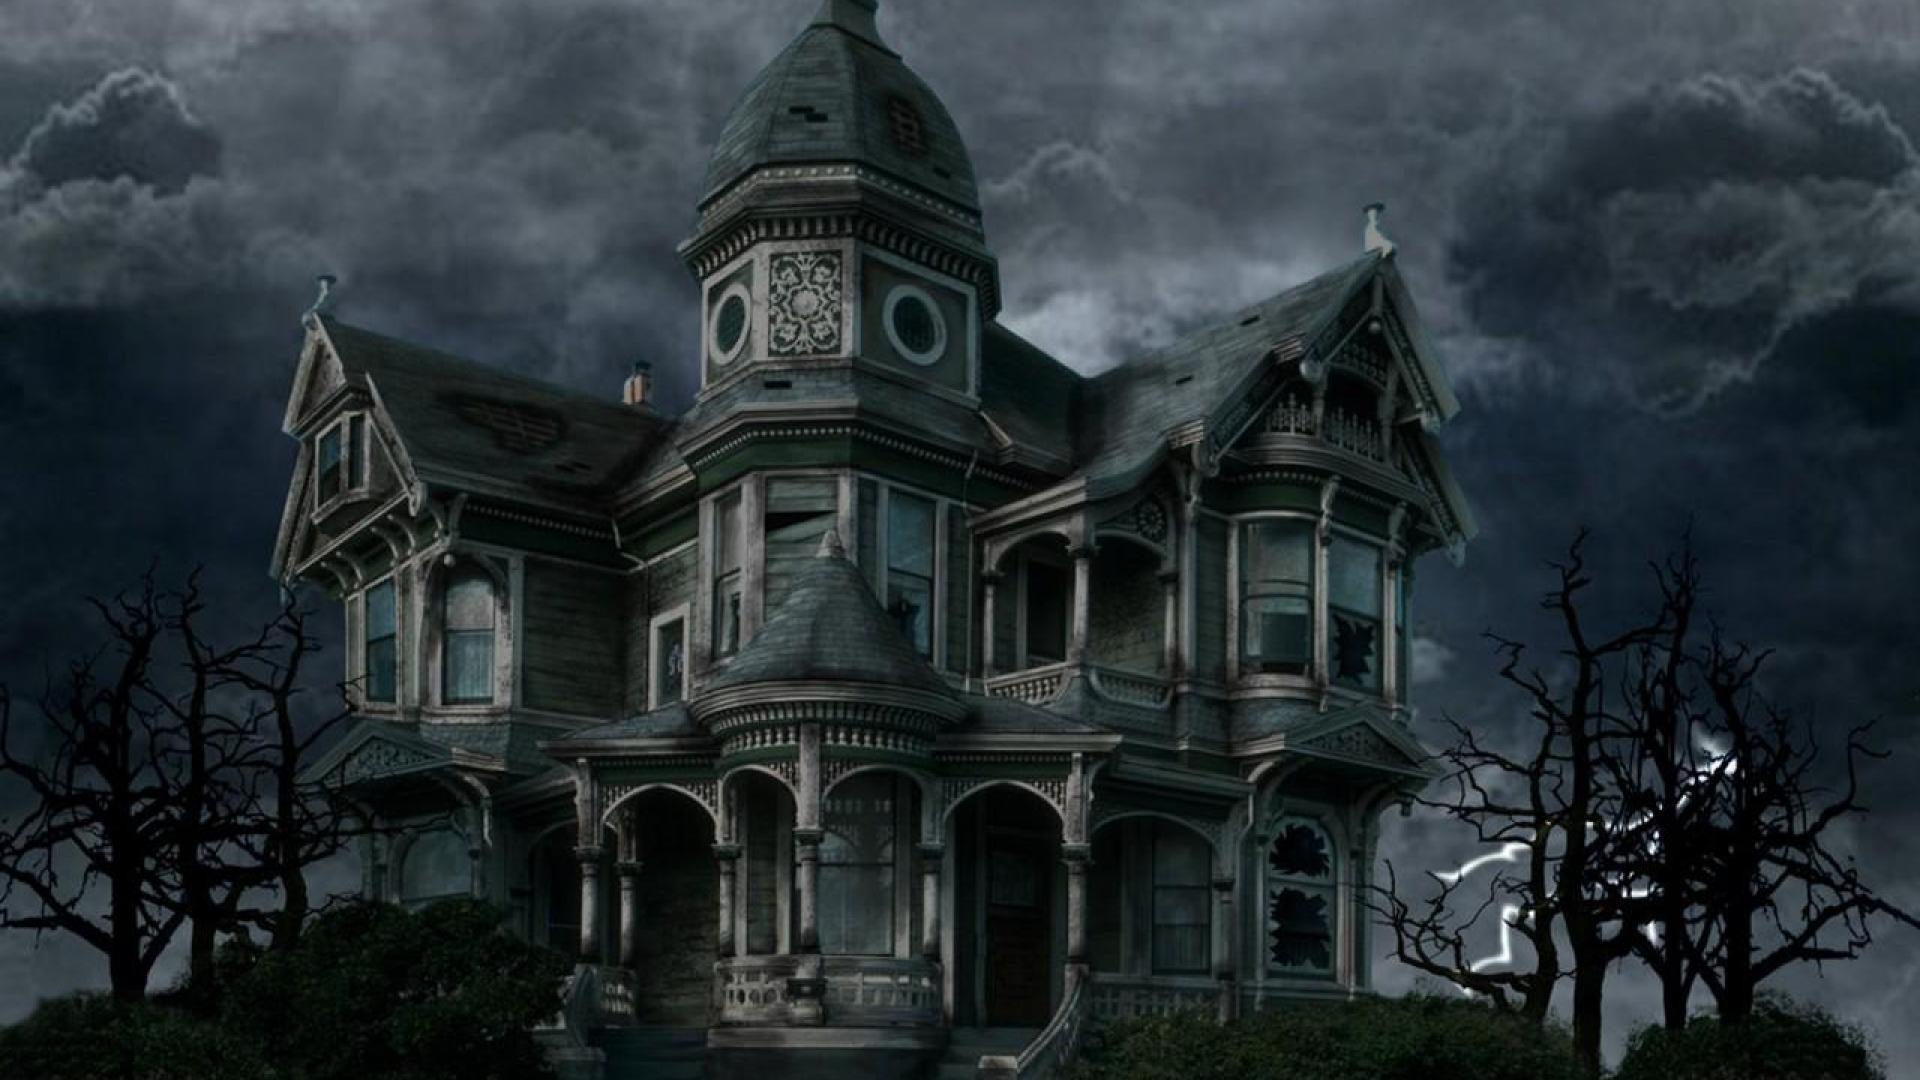 Haunted House Wallpaper Desktop Haunted House Gif 1920x1080 Download Hd Wallpaper Wallpapertip